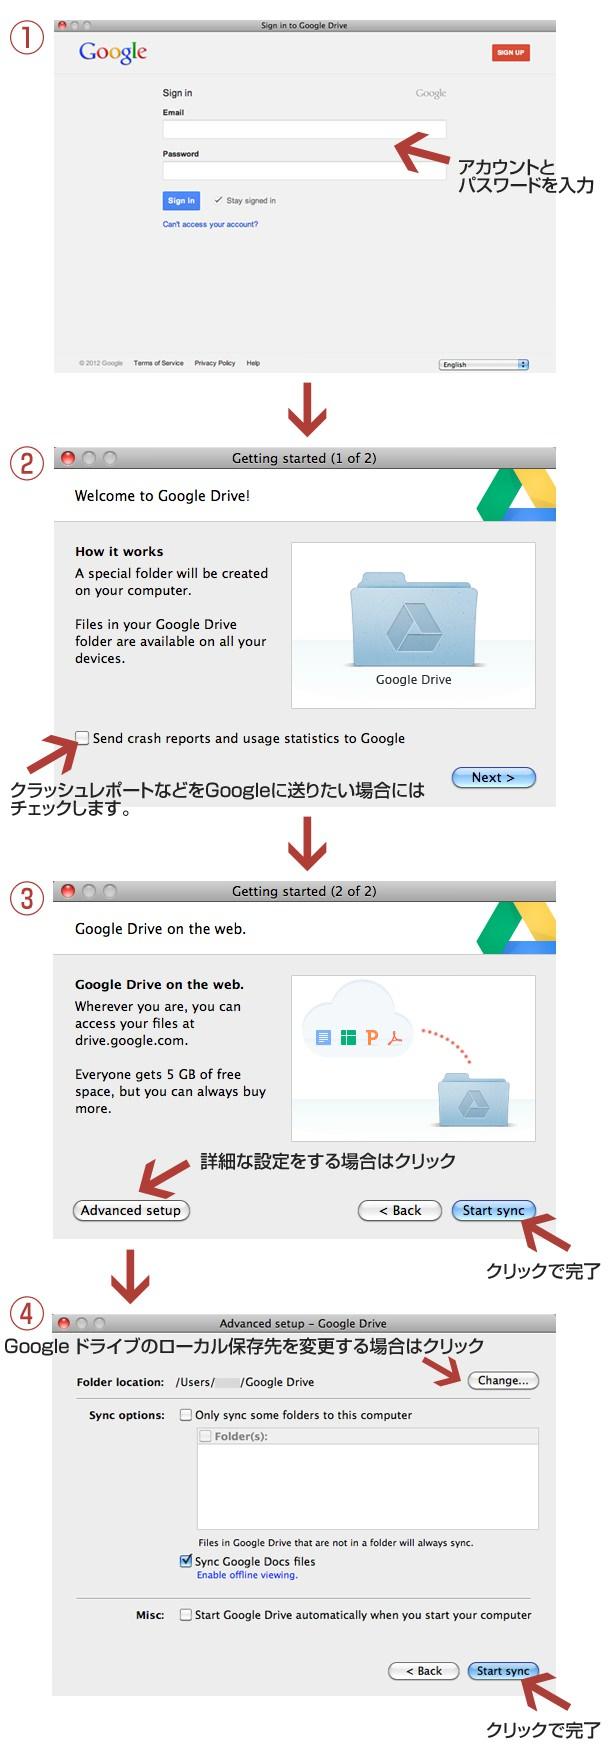 googledrive info 04